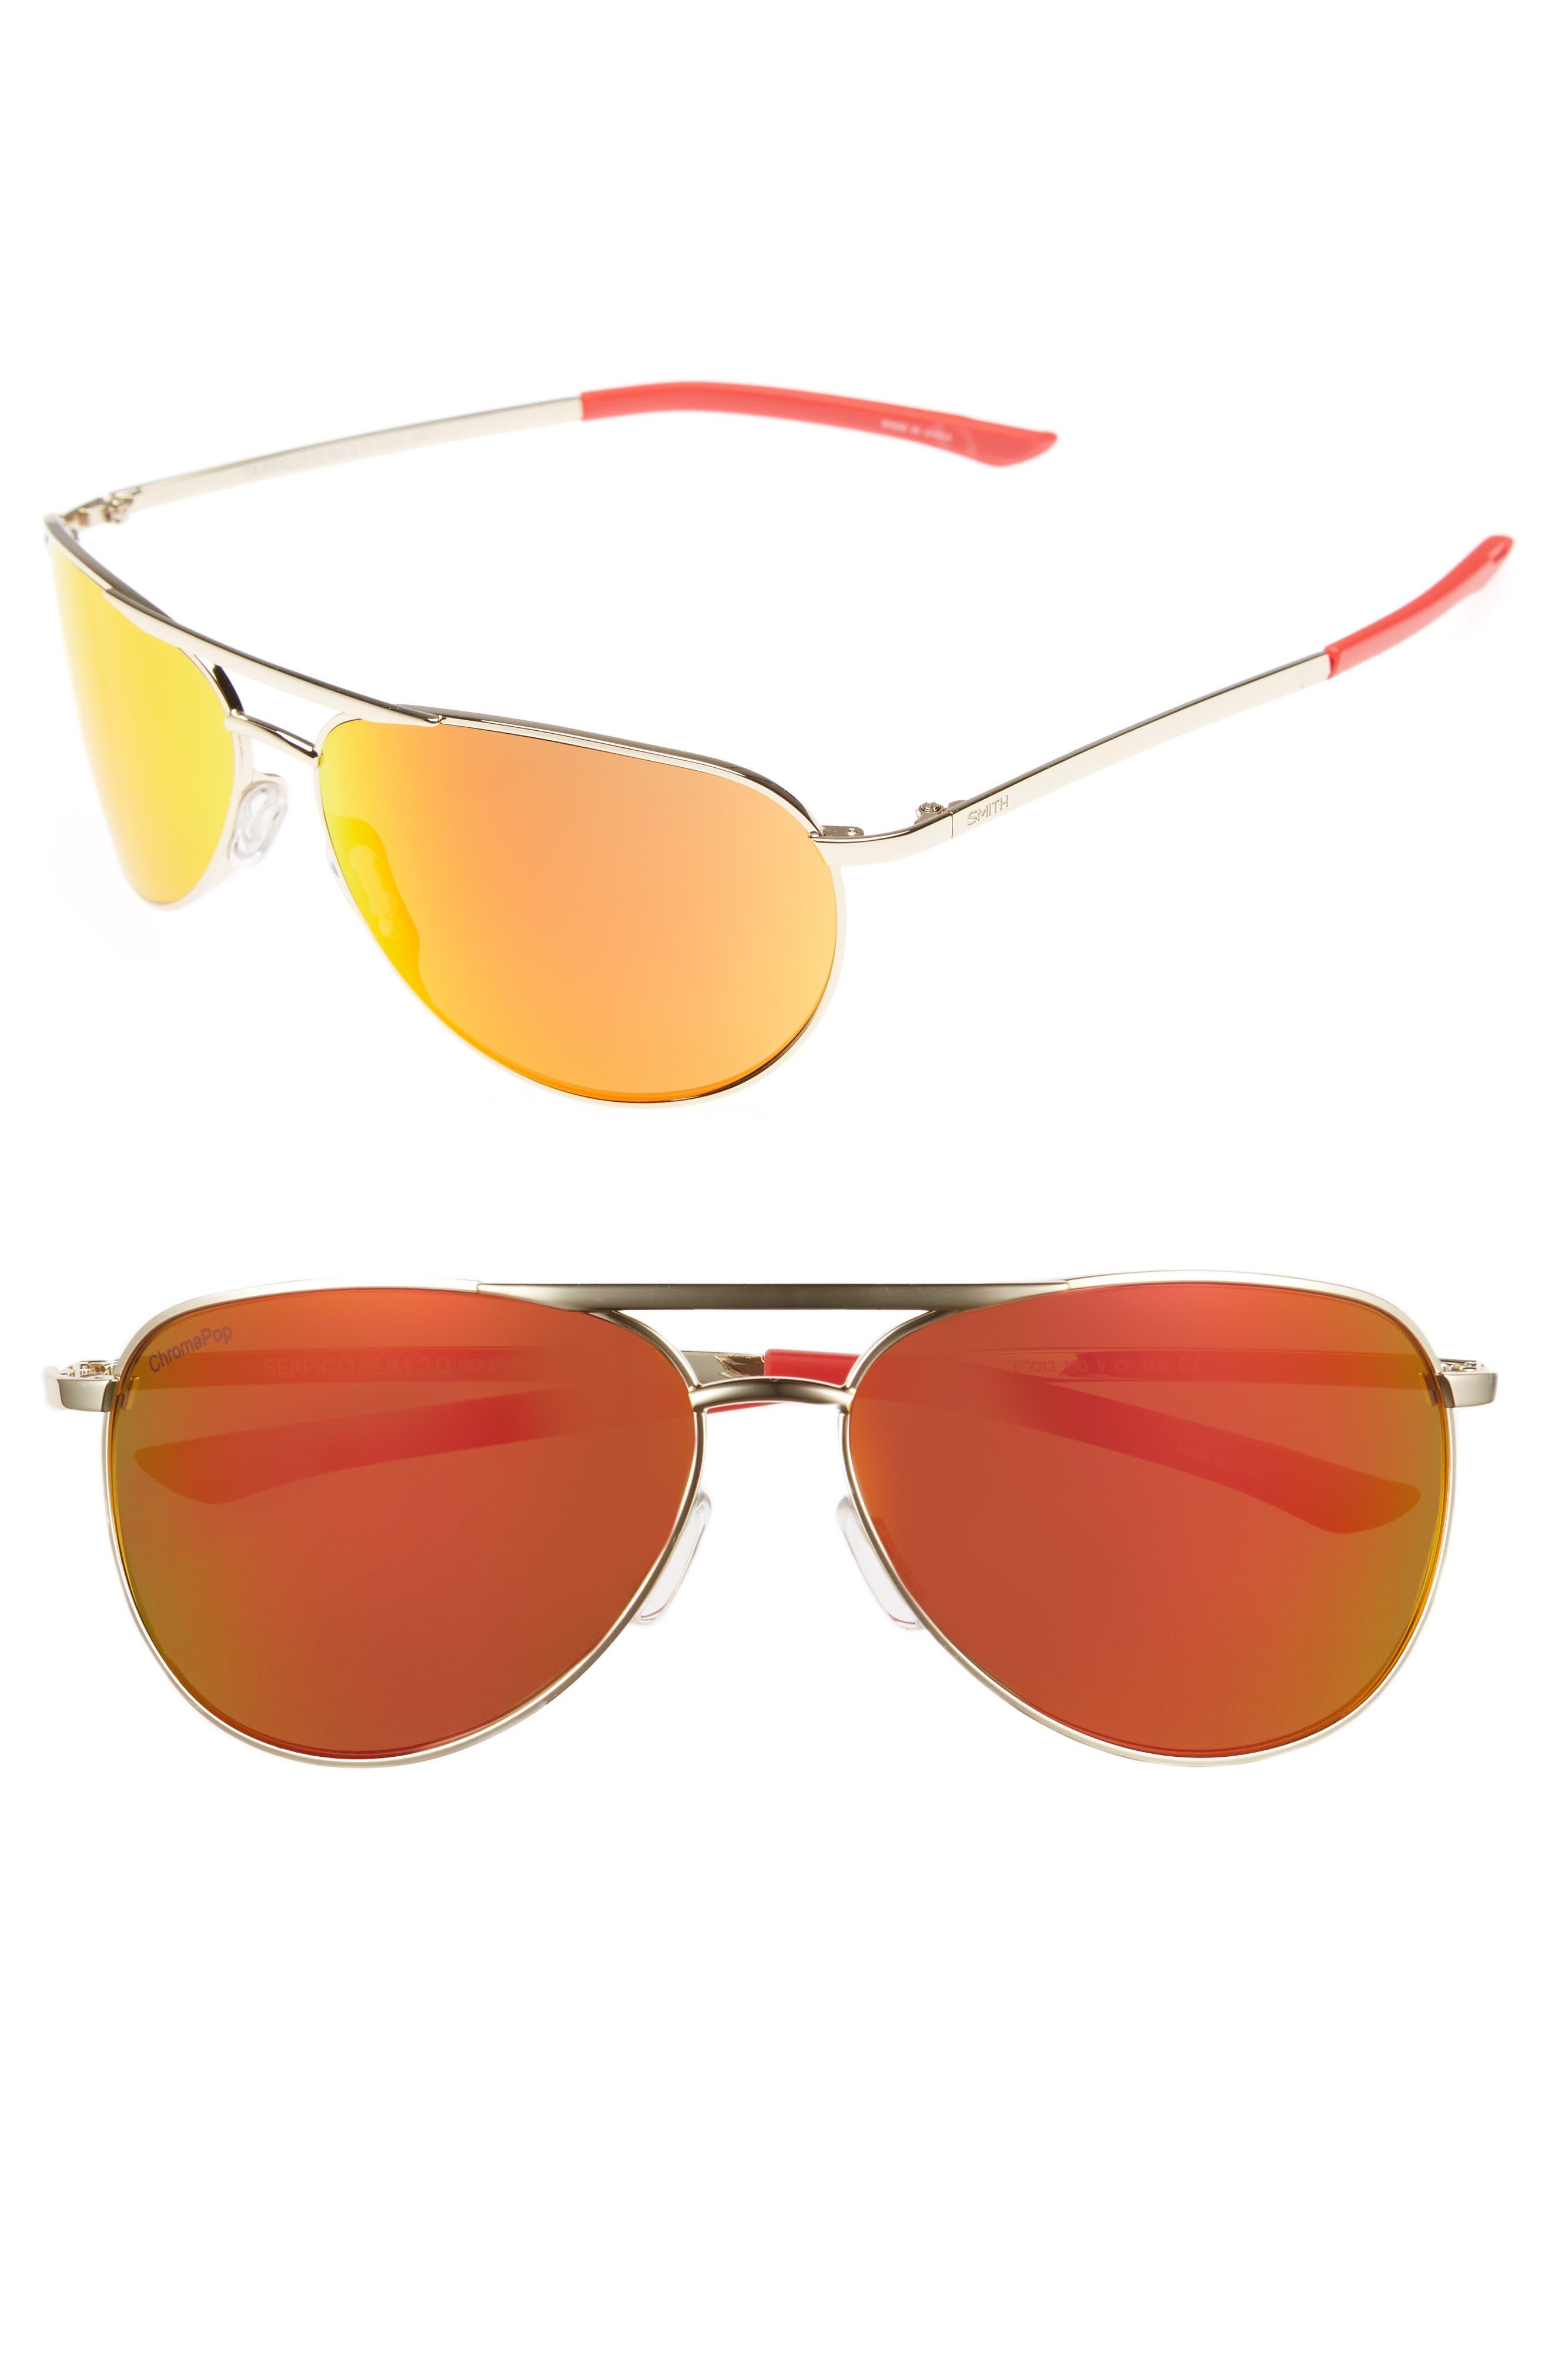 Serpico Slim 2.0 60mm ChromaPop Polarized Aviator Sunglasses,                         Main,                         color, 710